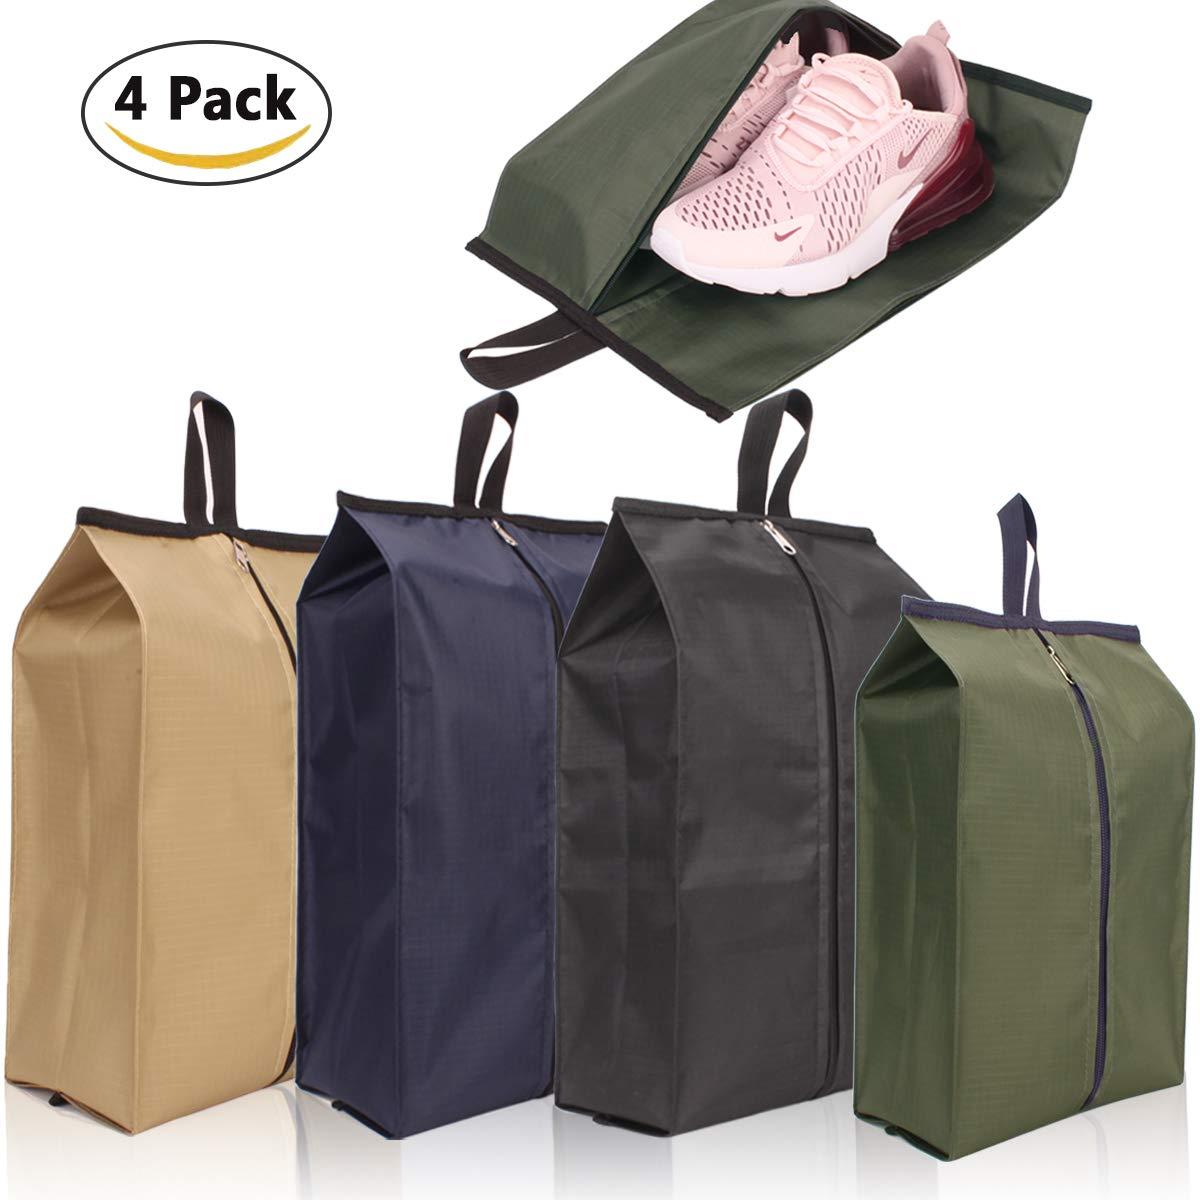 Achiou Travel Shoe Bags Thick 4 Colors Mix Stereoscopic Dustproof Portable Waterproof with Zipper(1L+3XL)